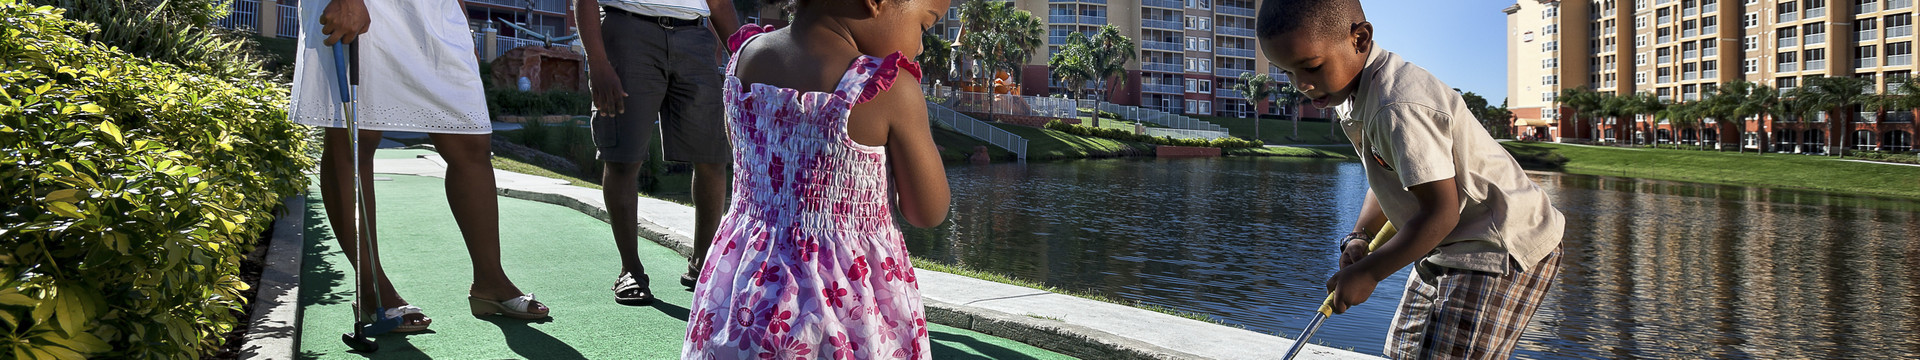 Mini Golf in Kissimmee, FL near Disney World | Family Playing Mini Golf